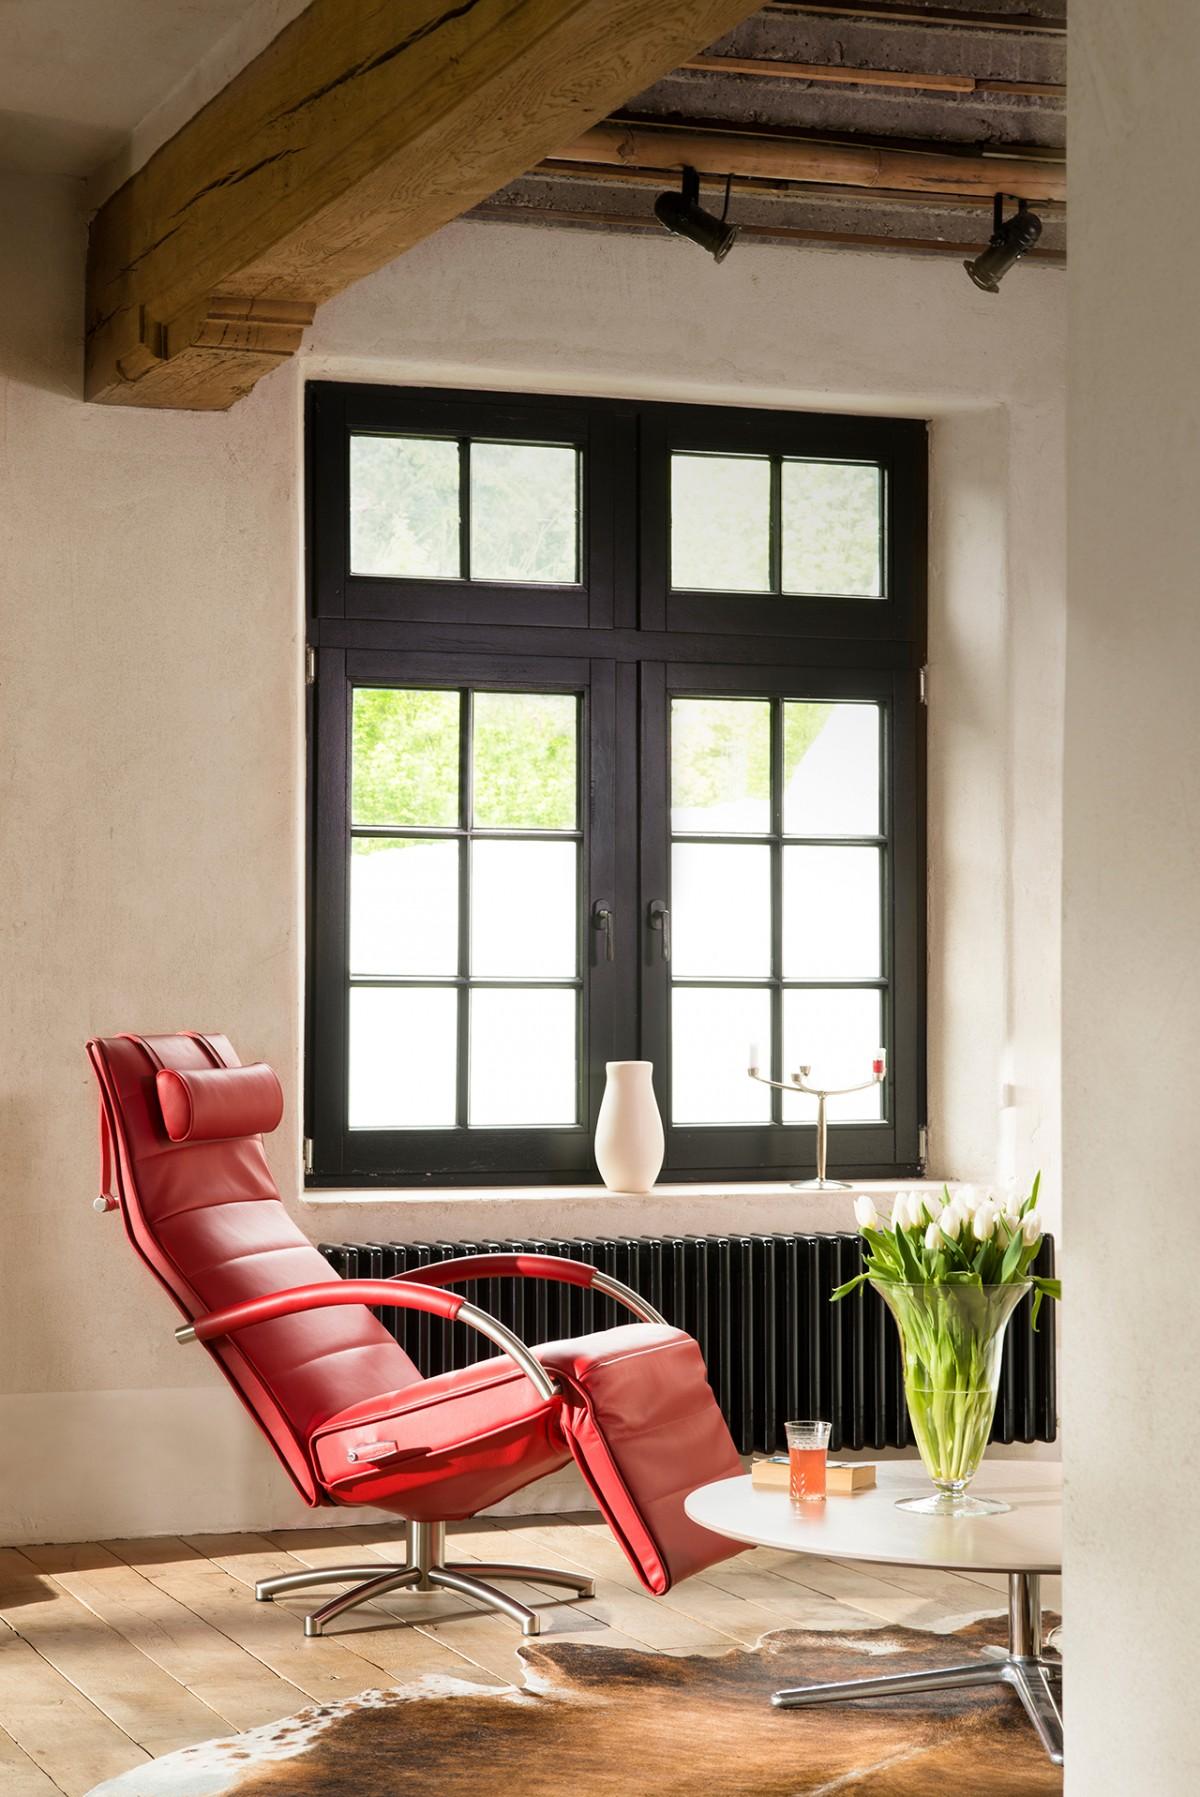 mensana relaxsessel product mbel aus stoff leder jori - Bergroe Sessel Chaiselongue